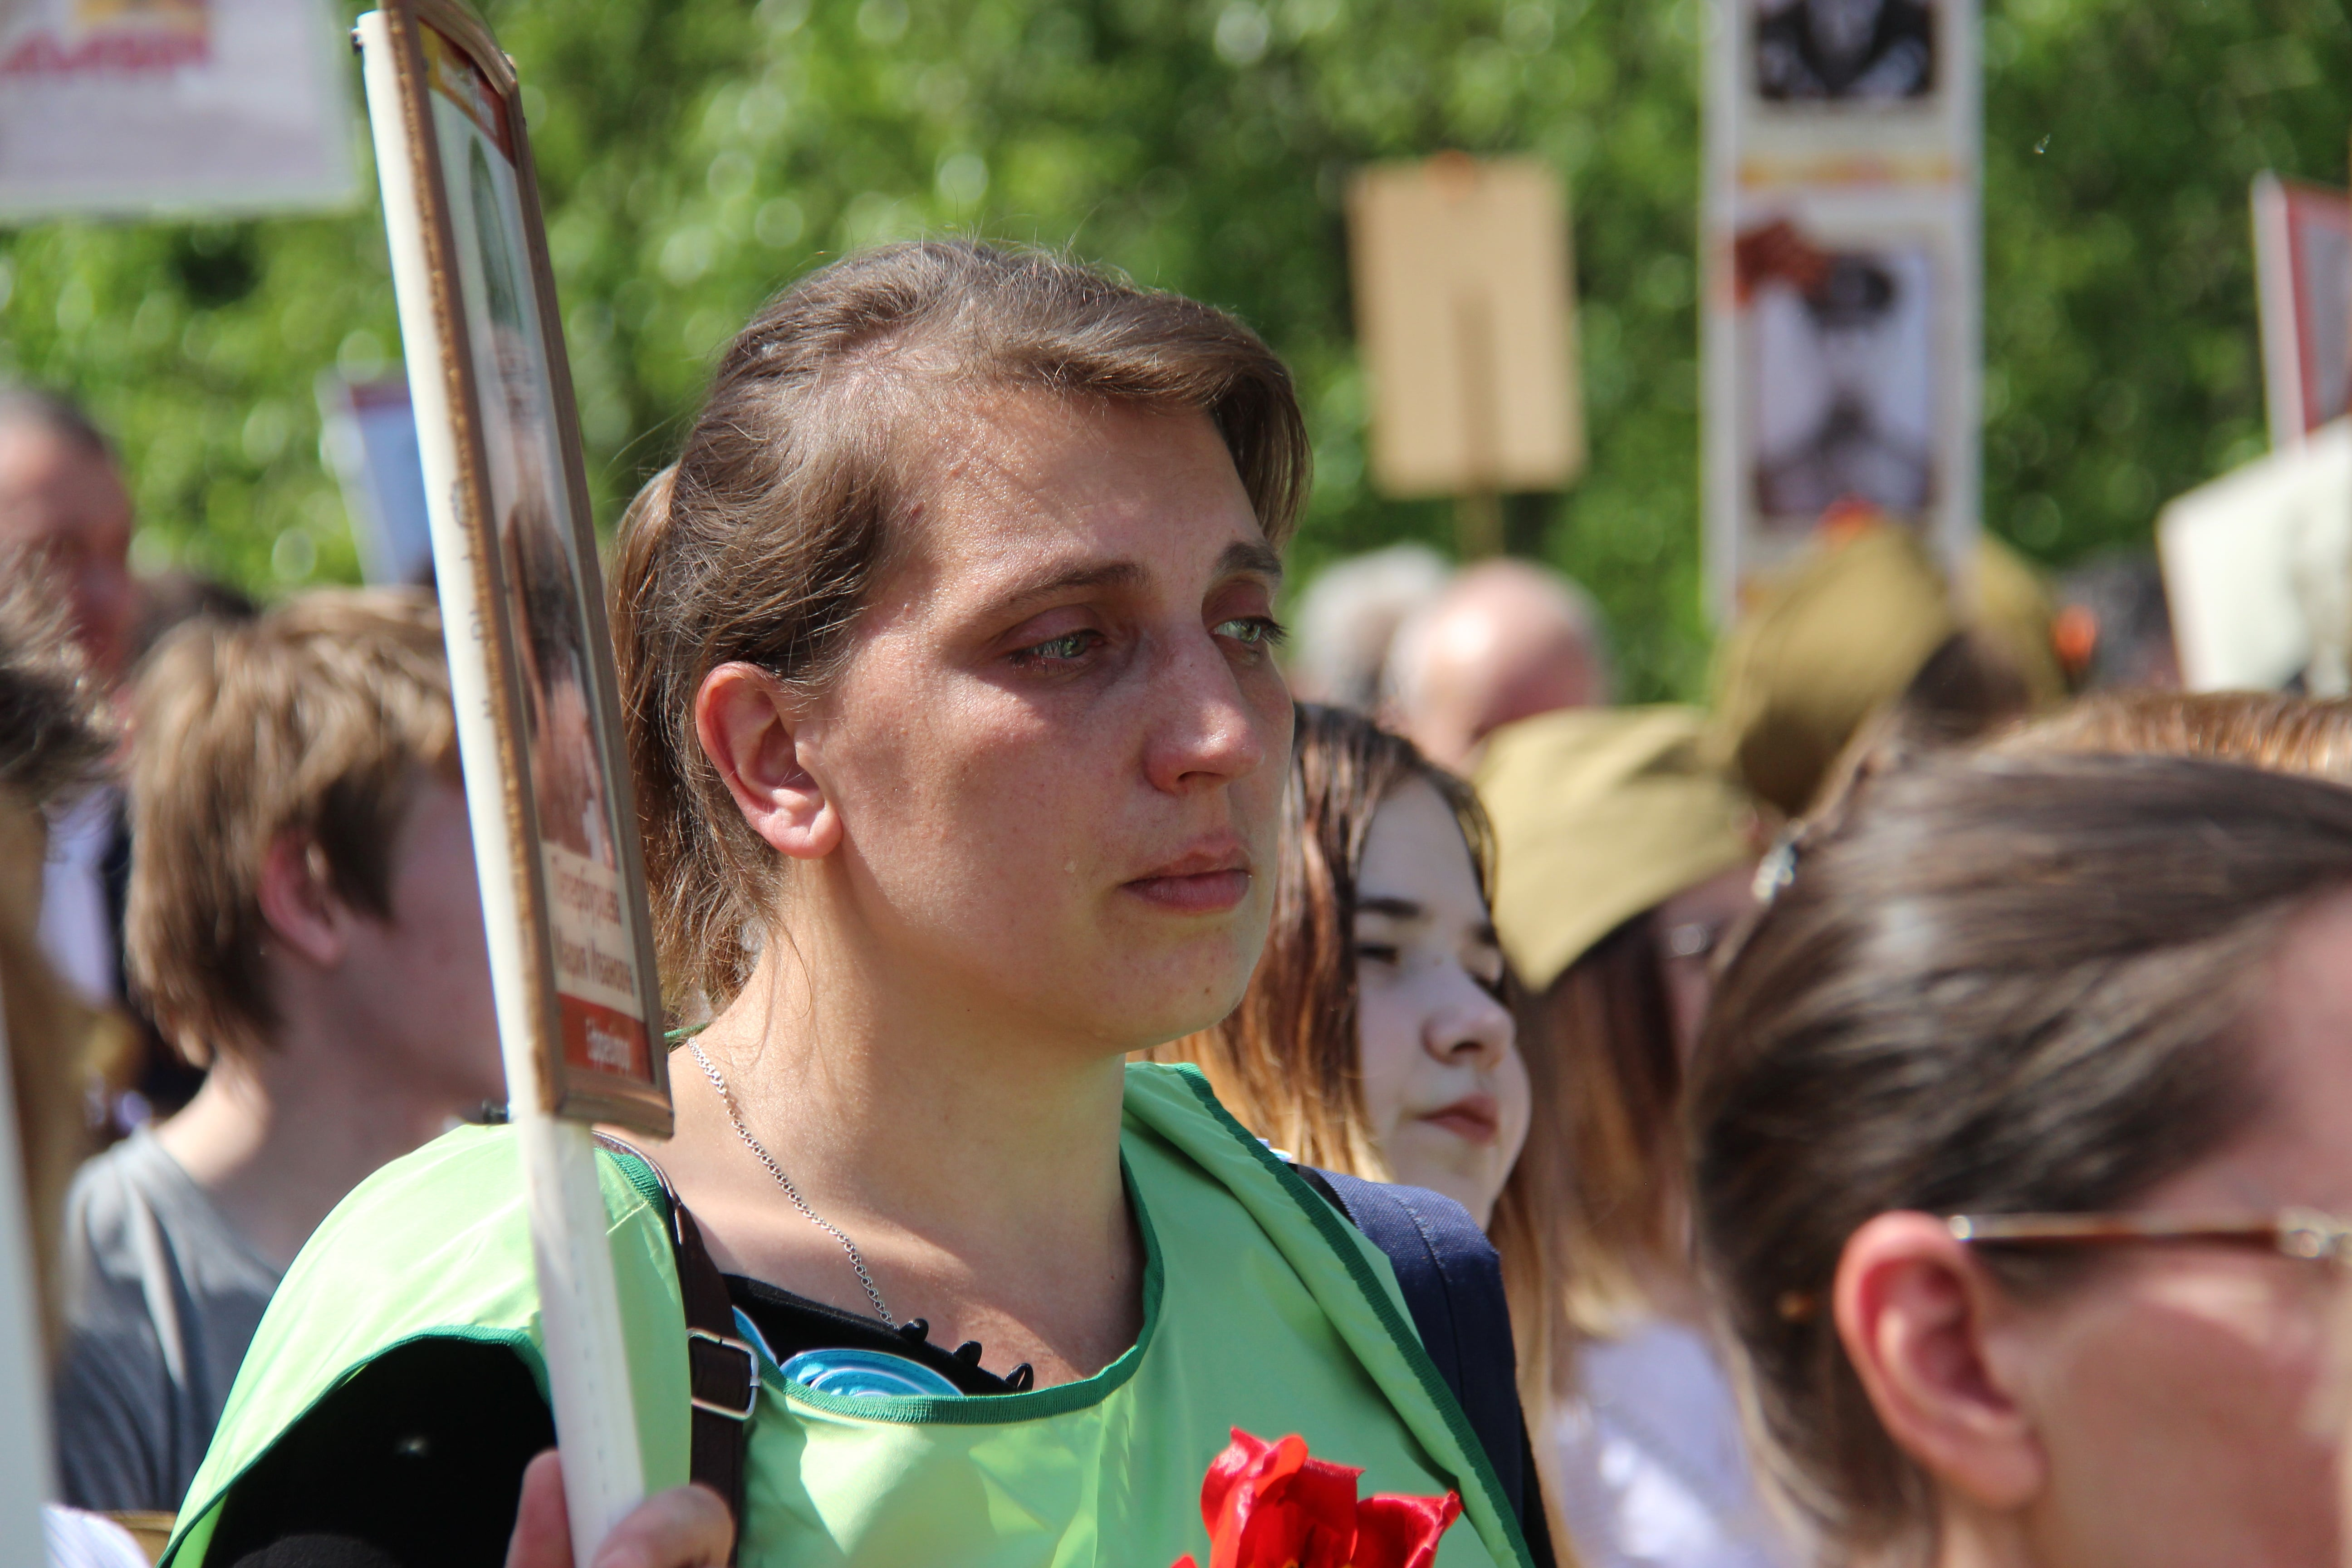 http://monuspen.ru/photoreports/ba2010941251efe9afabca220cb49d90.JPG